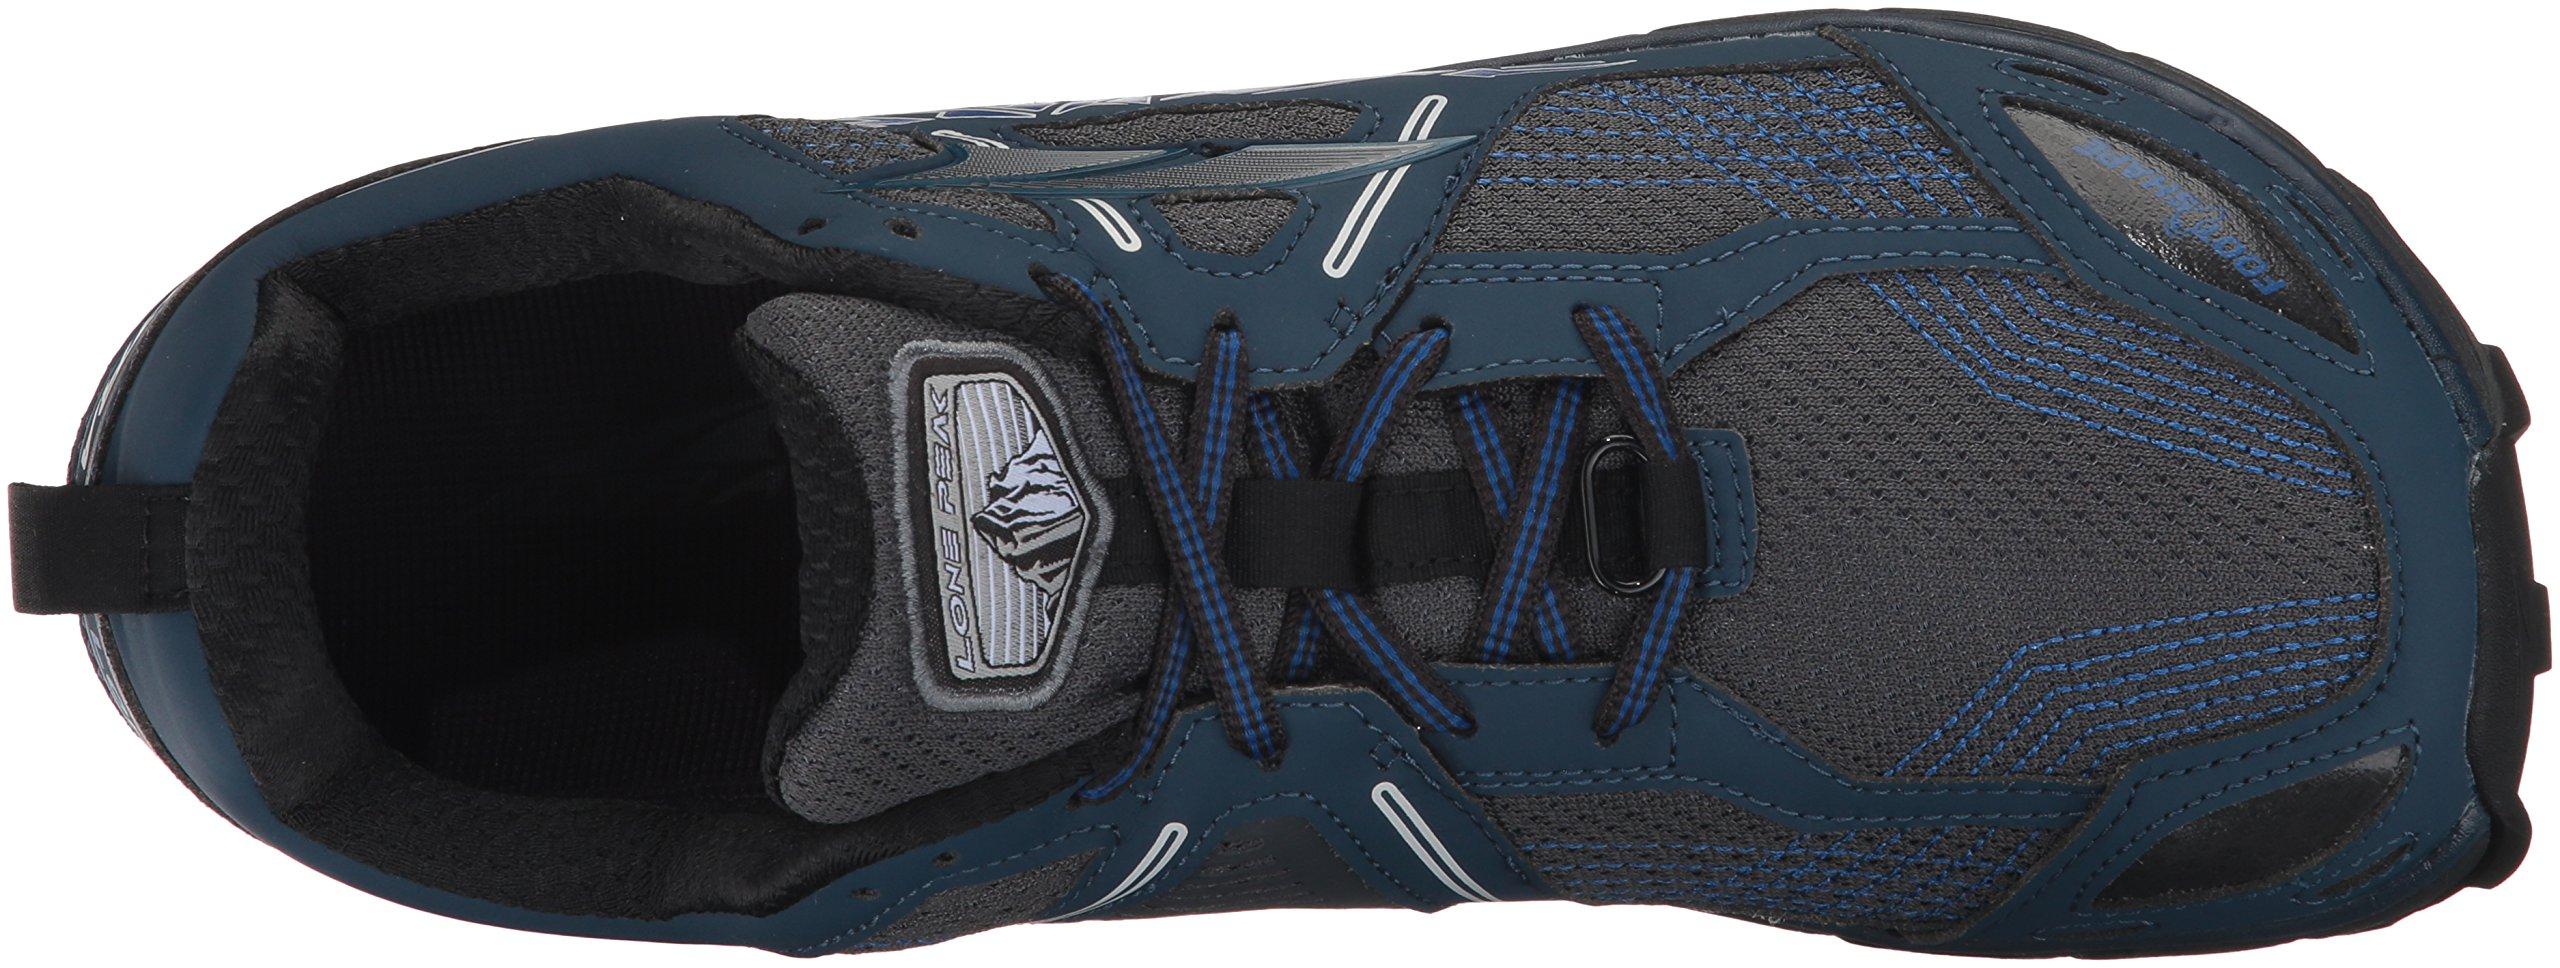 Altra Men's Lone Peak 3.5 Trail Running Shoe, Blue, 12 D US by Altra (Image #8)